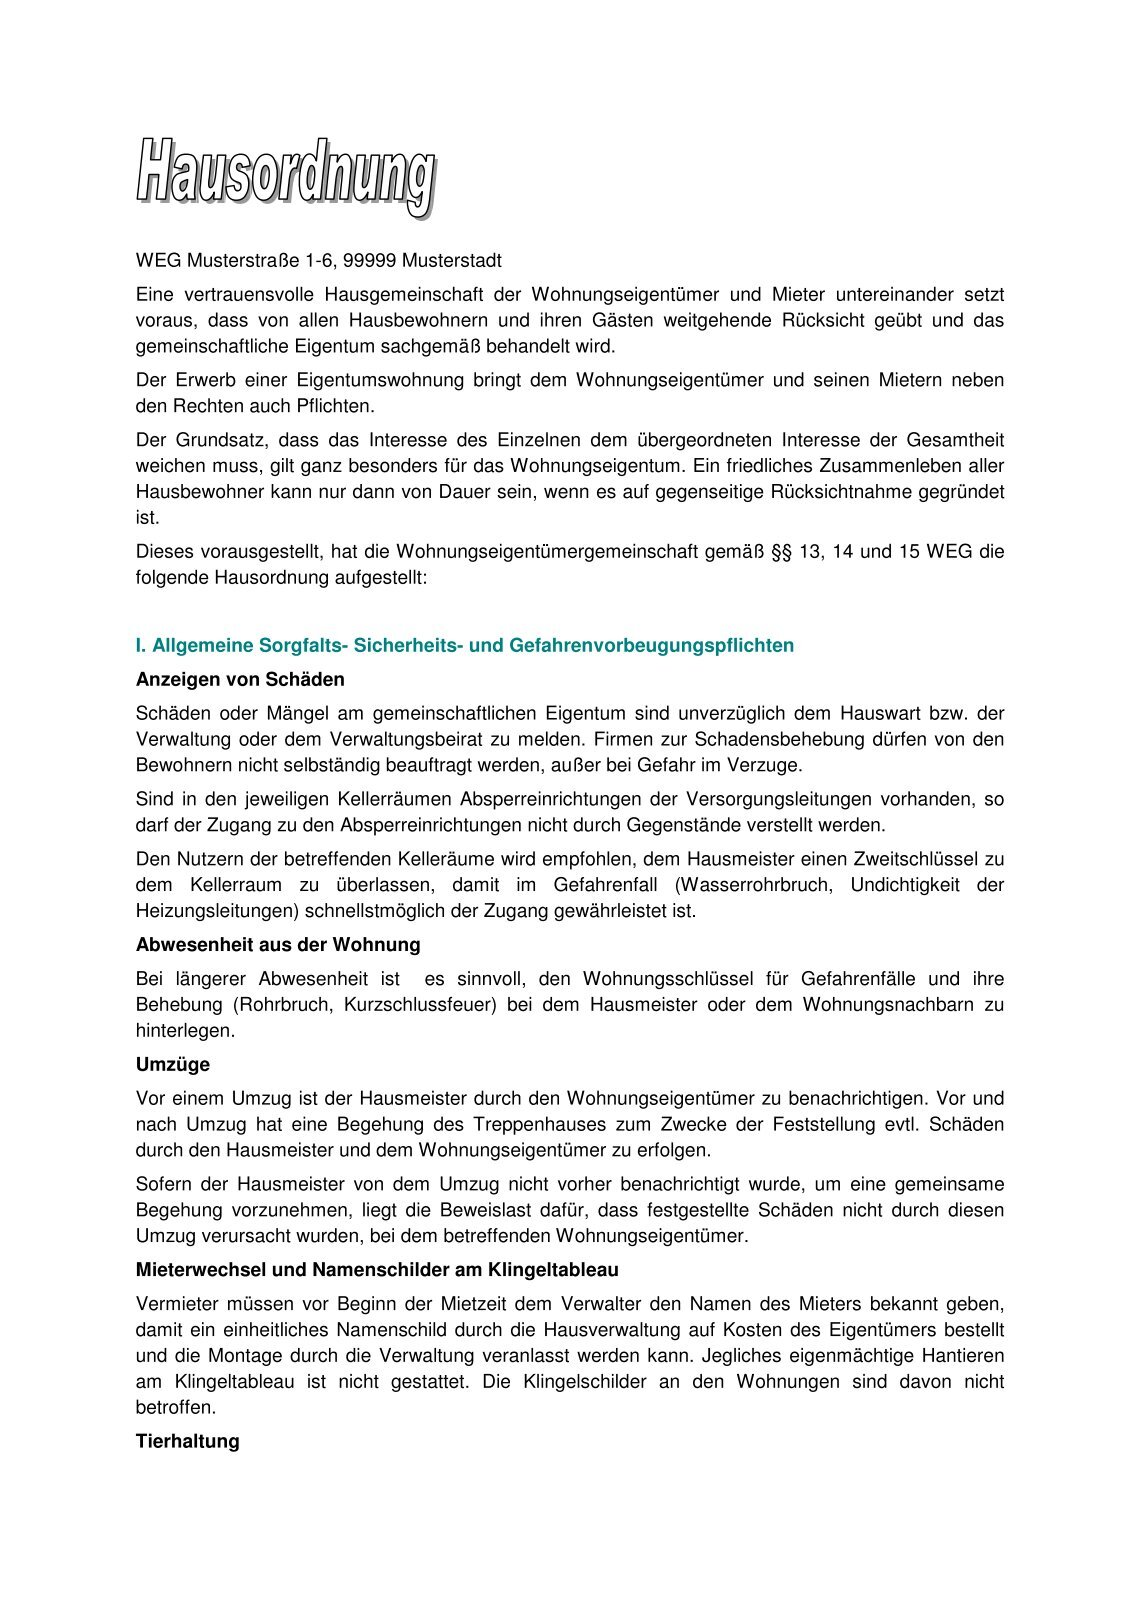 Charmant Barback Lebenslauf Anschreiben Galerie - Entry Level Resume ...